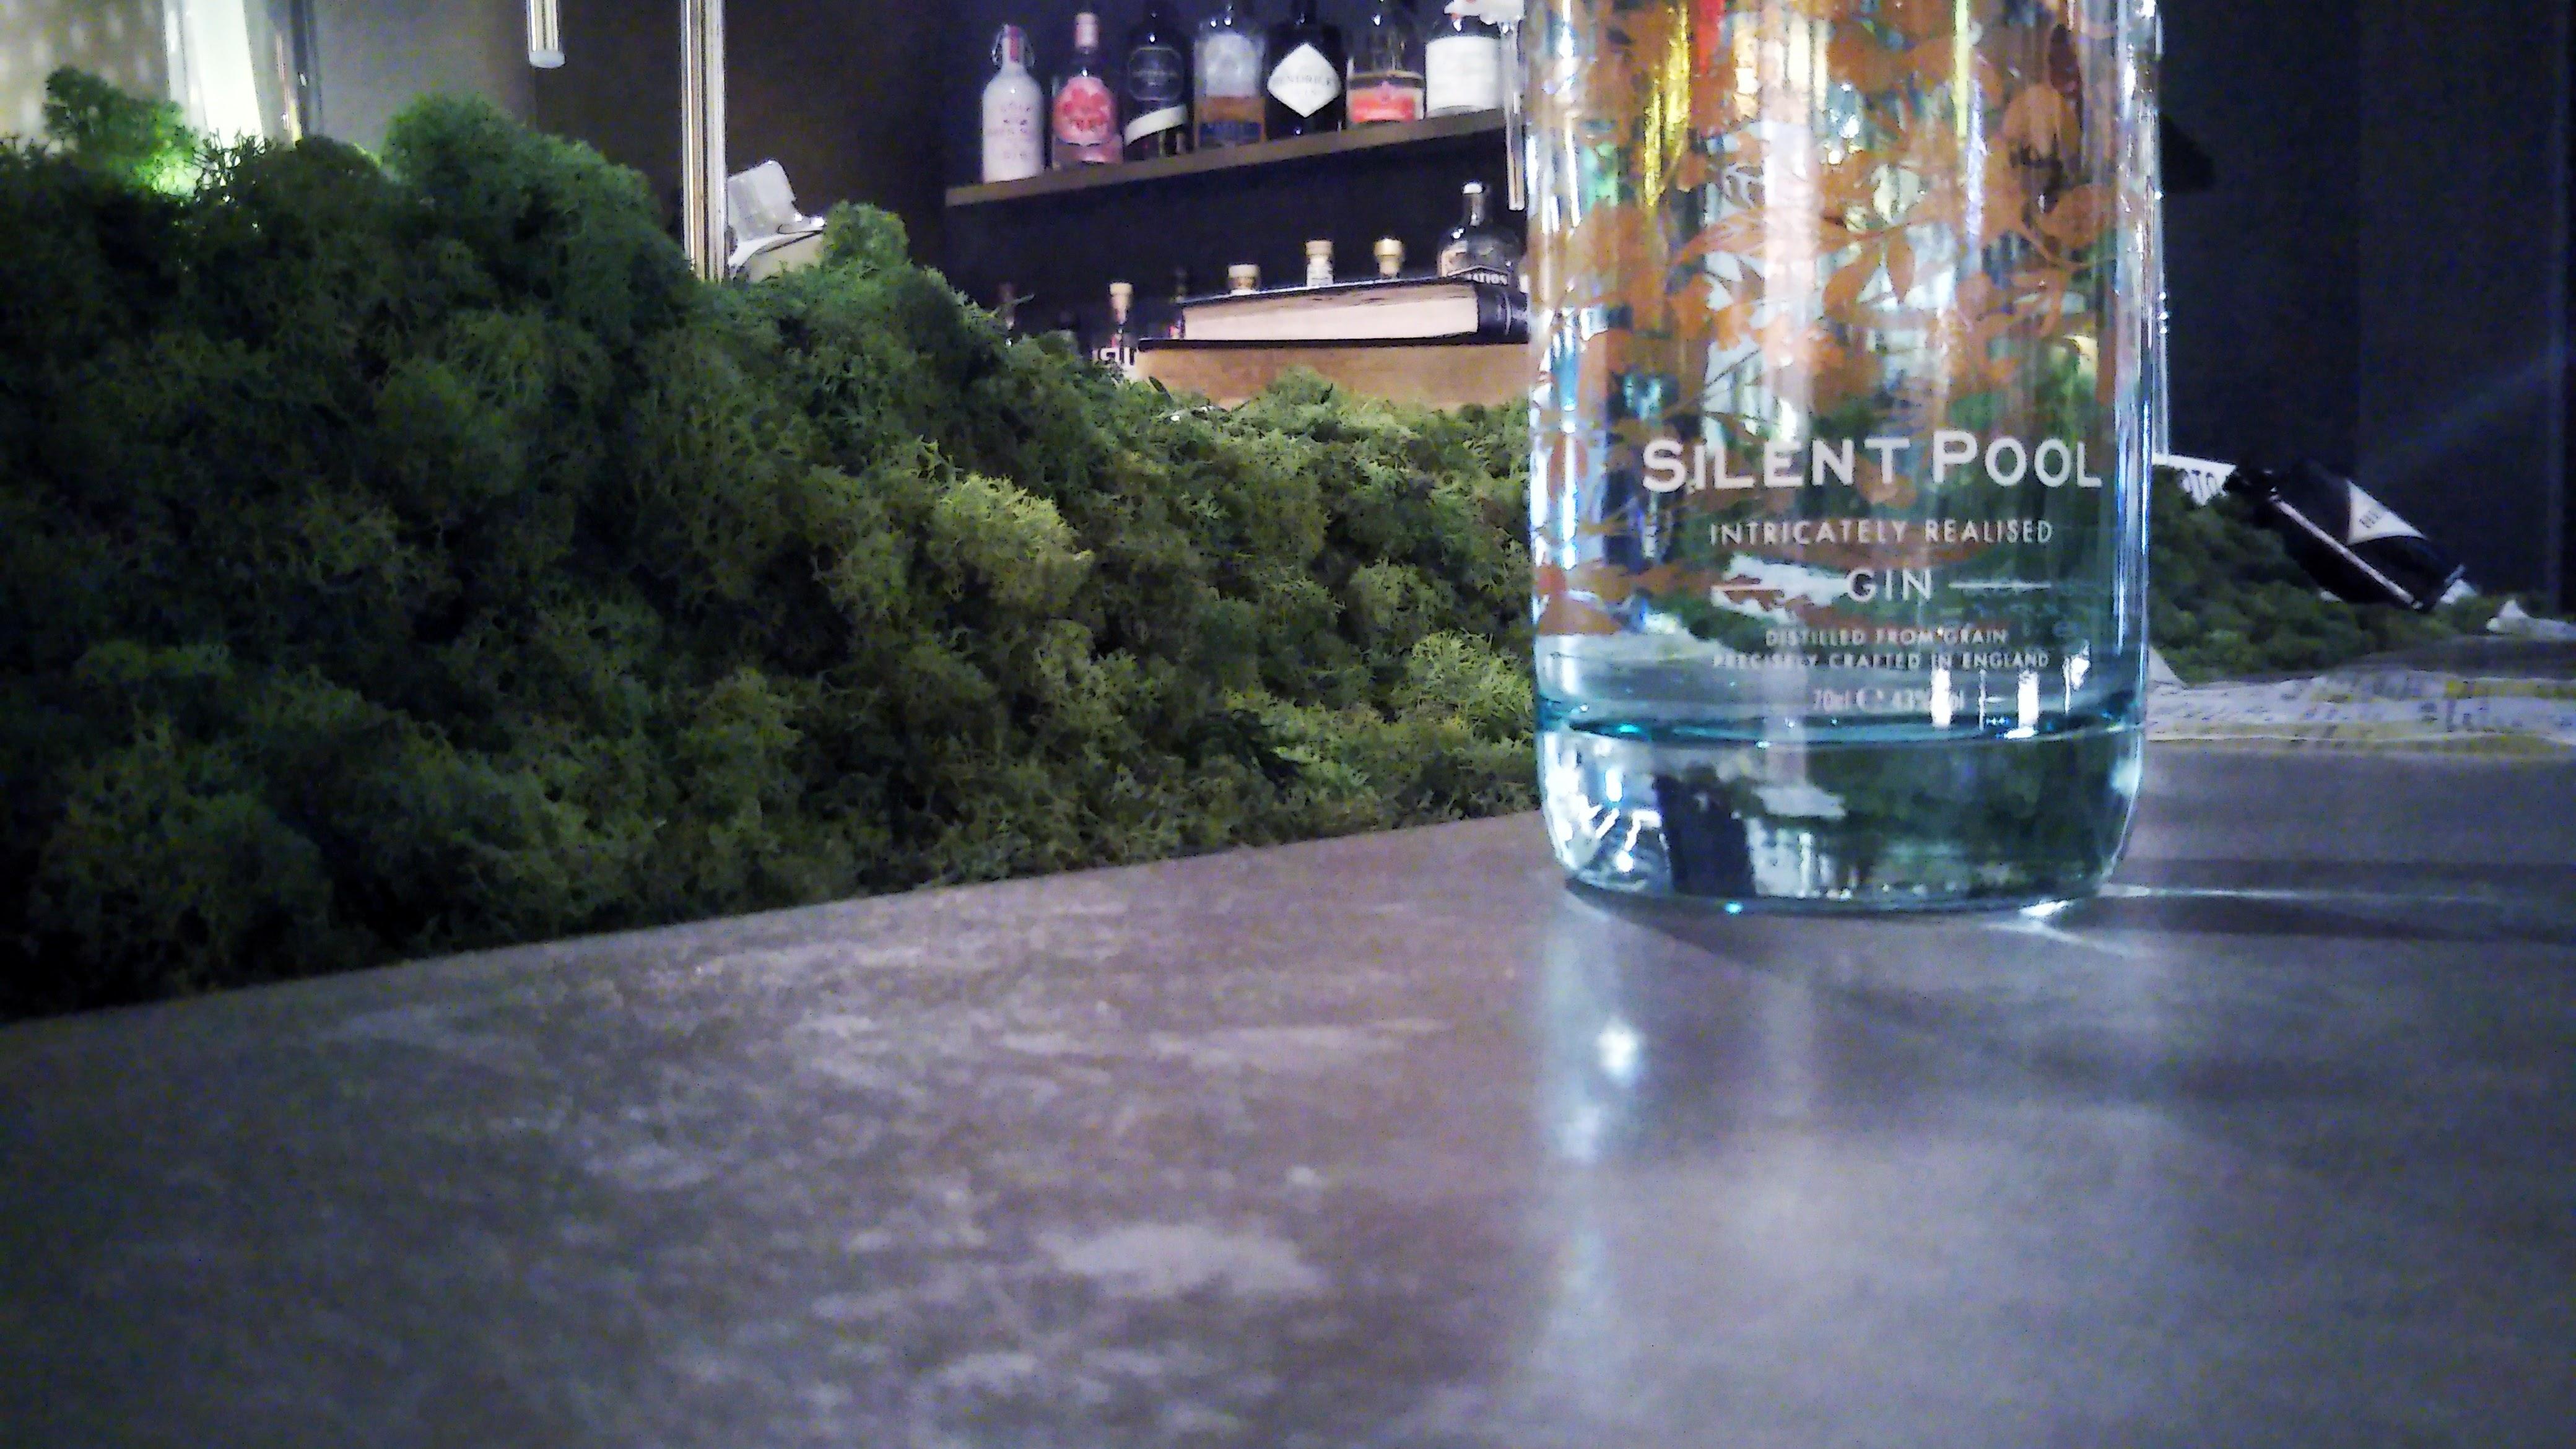 SILENT POOR GIN / サイレントプール